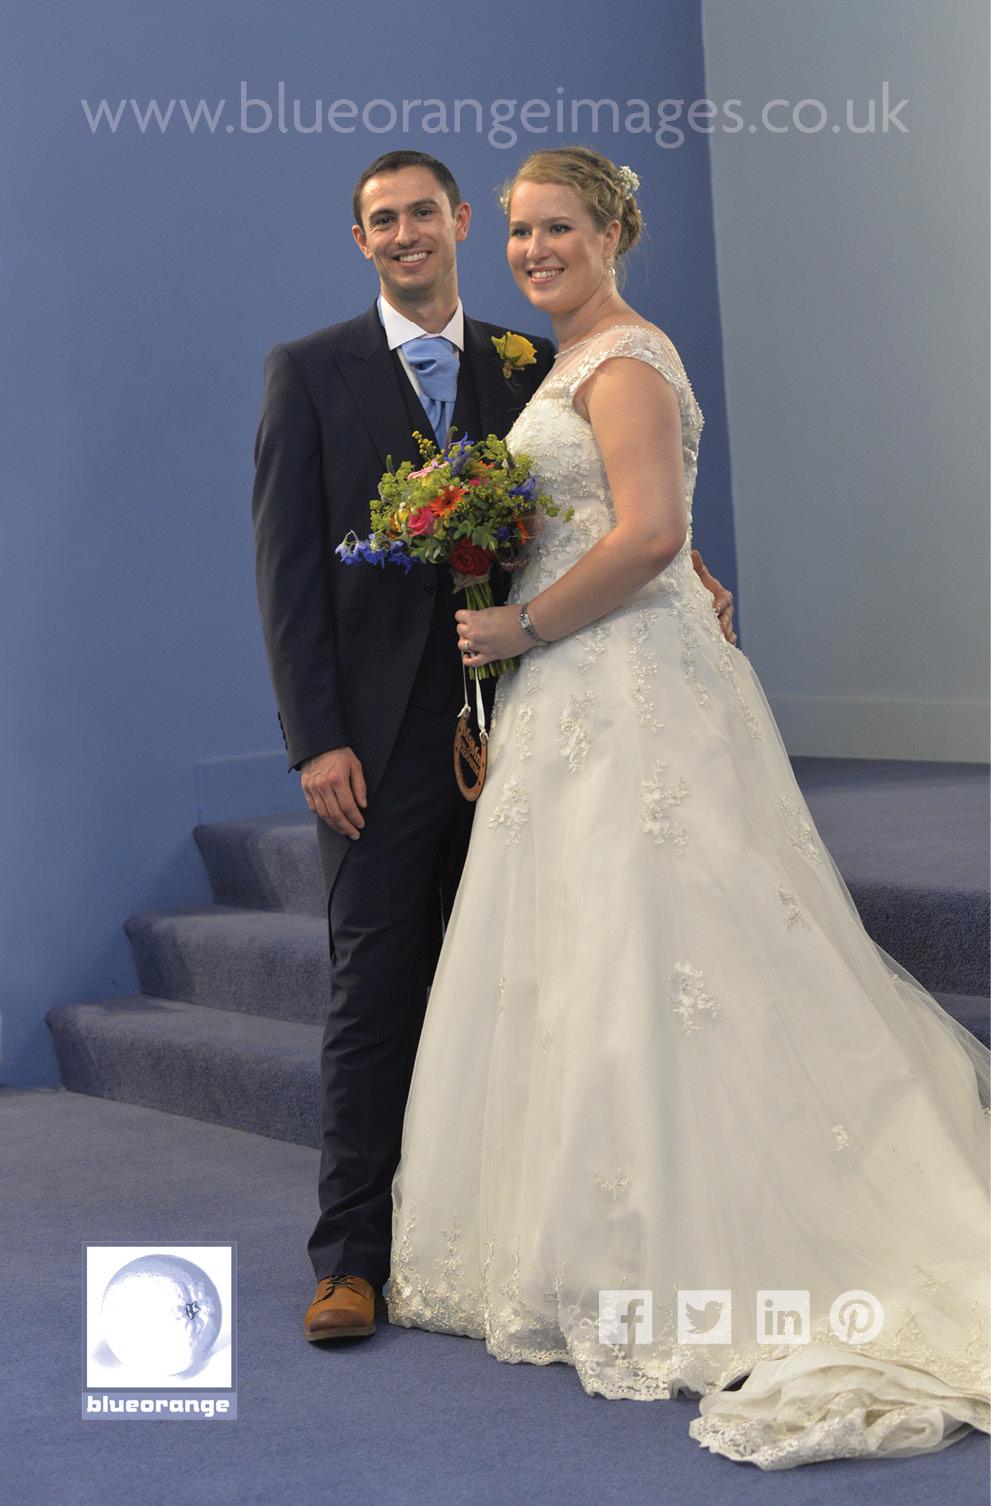 Katriona & Nick's wedding ceremony St Albans, Herts